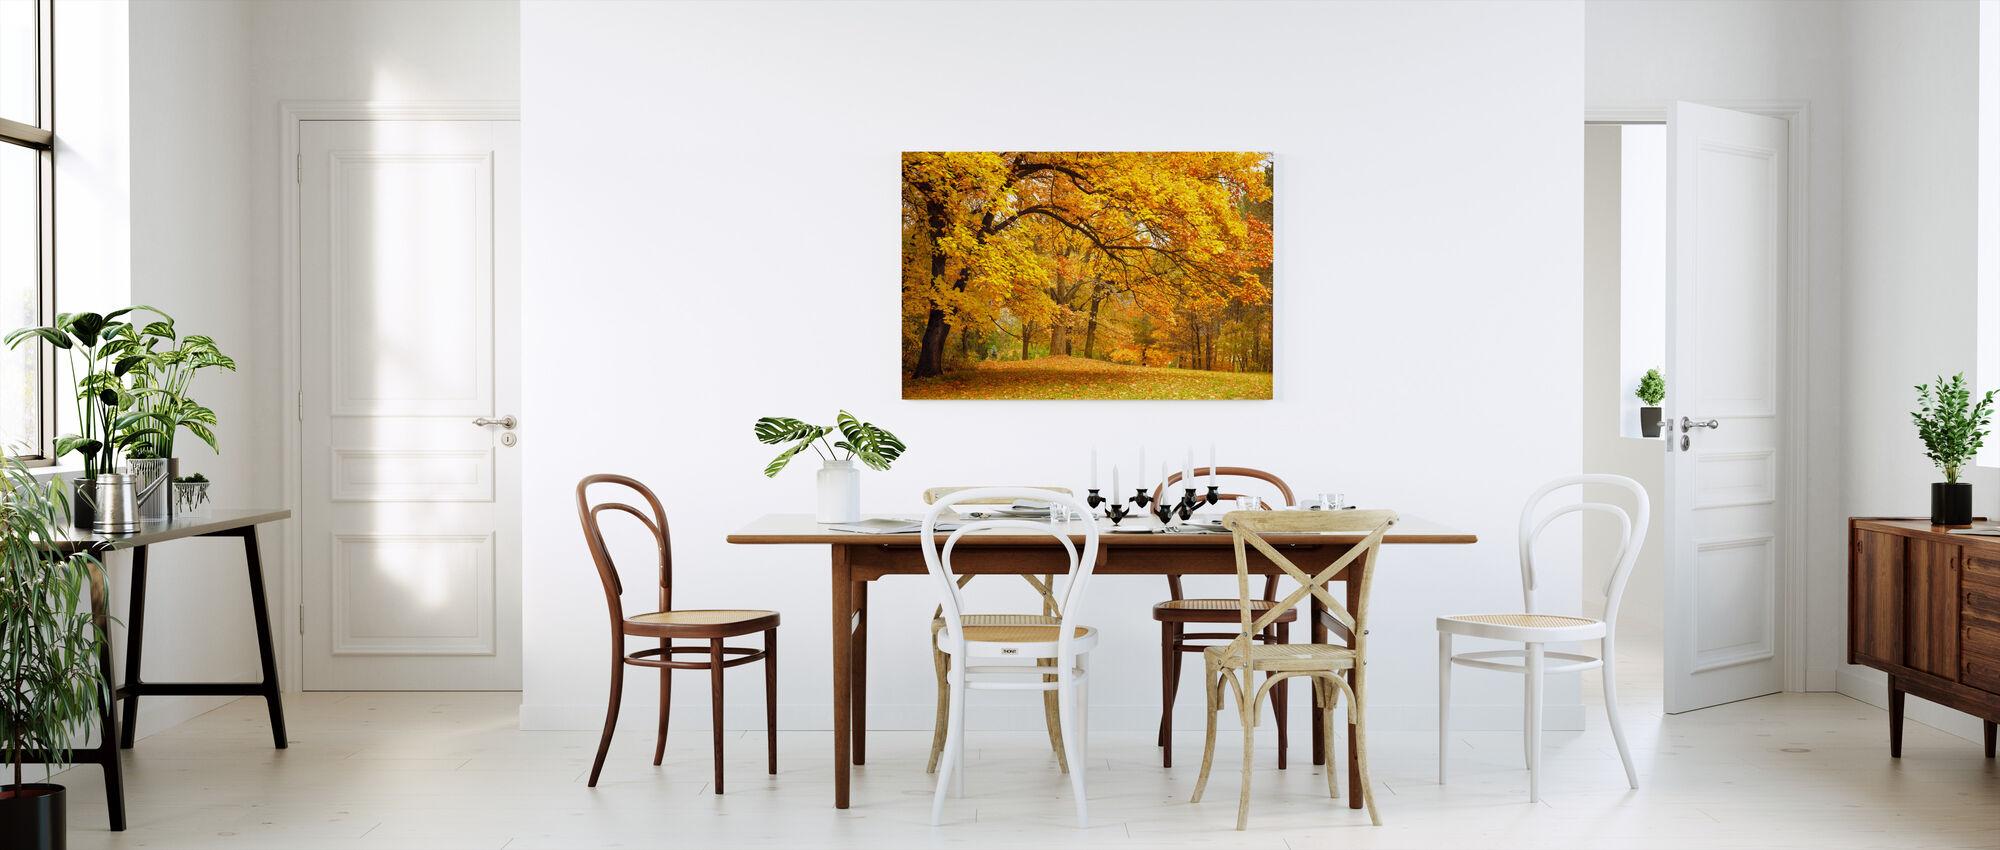 Colorful Autumn Leaves - Canvas print - Kitchen